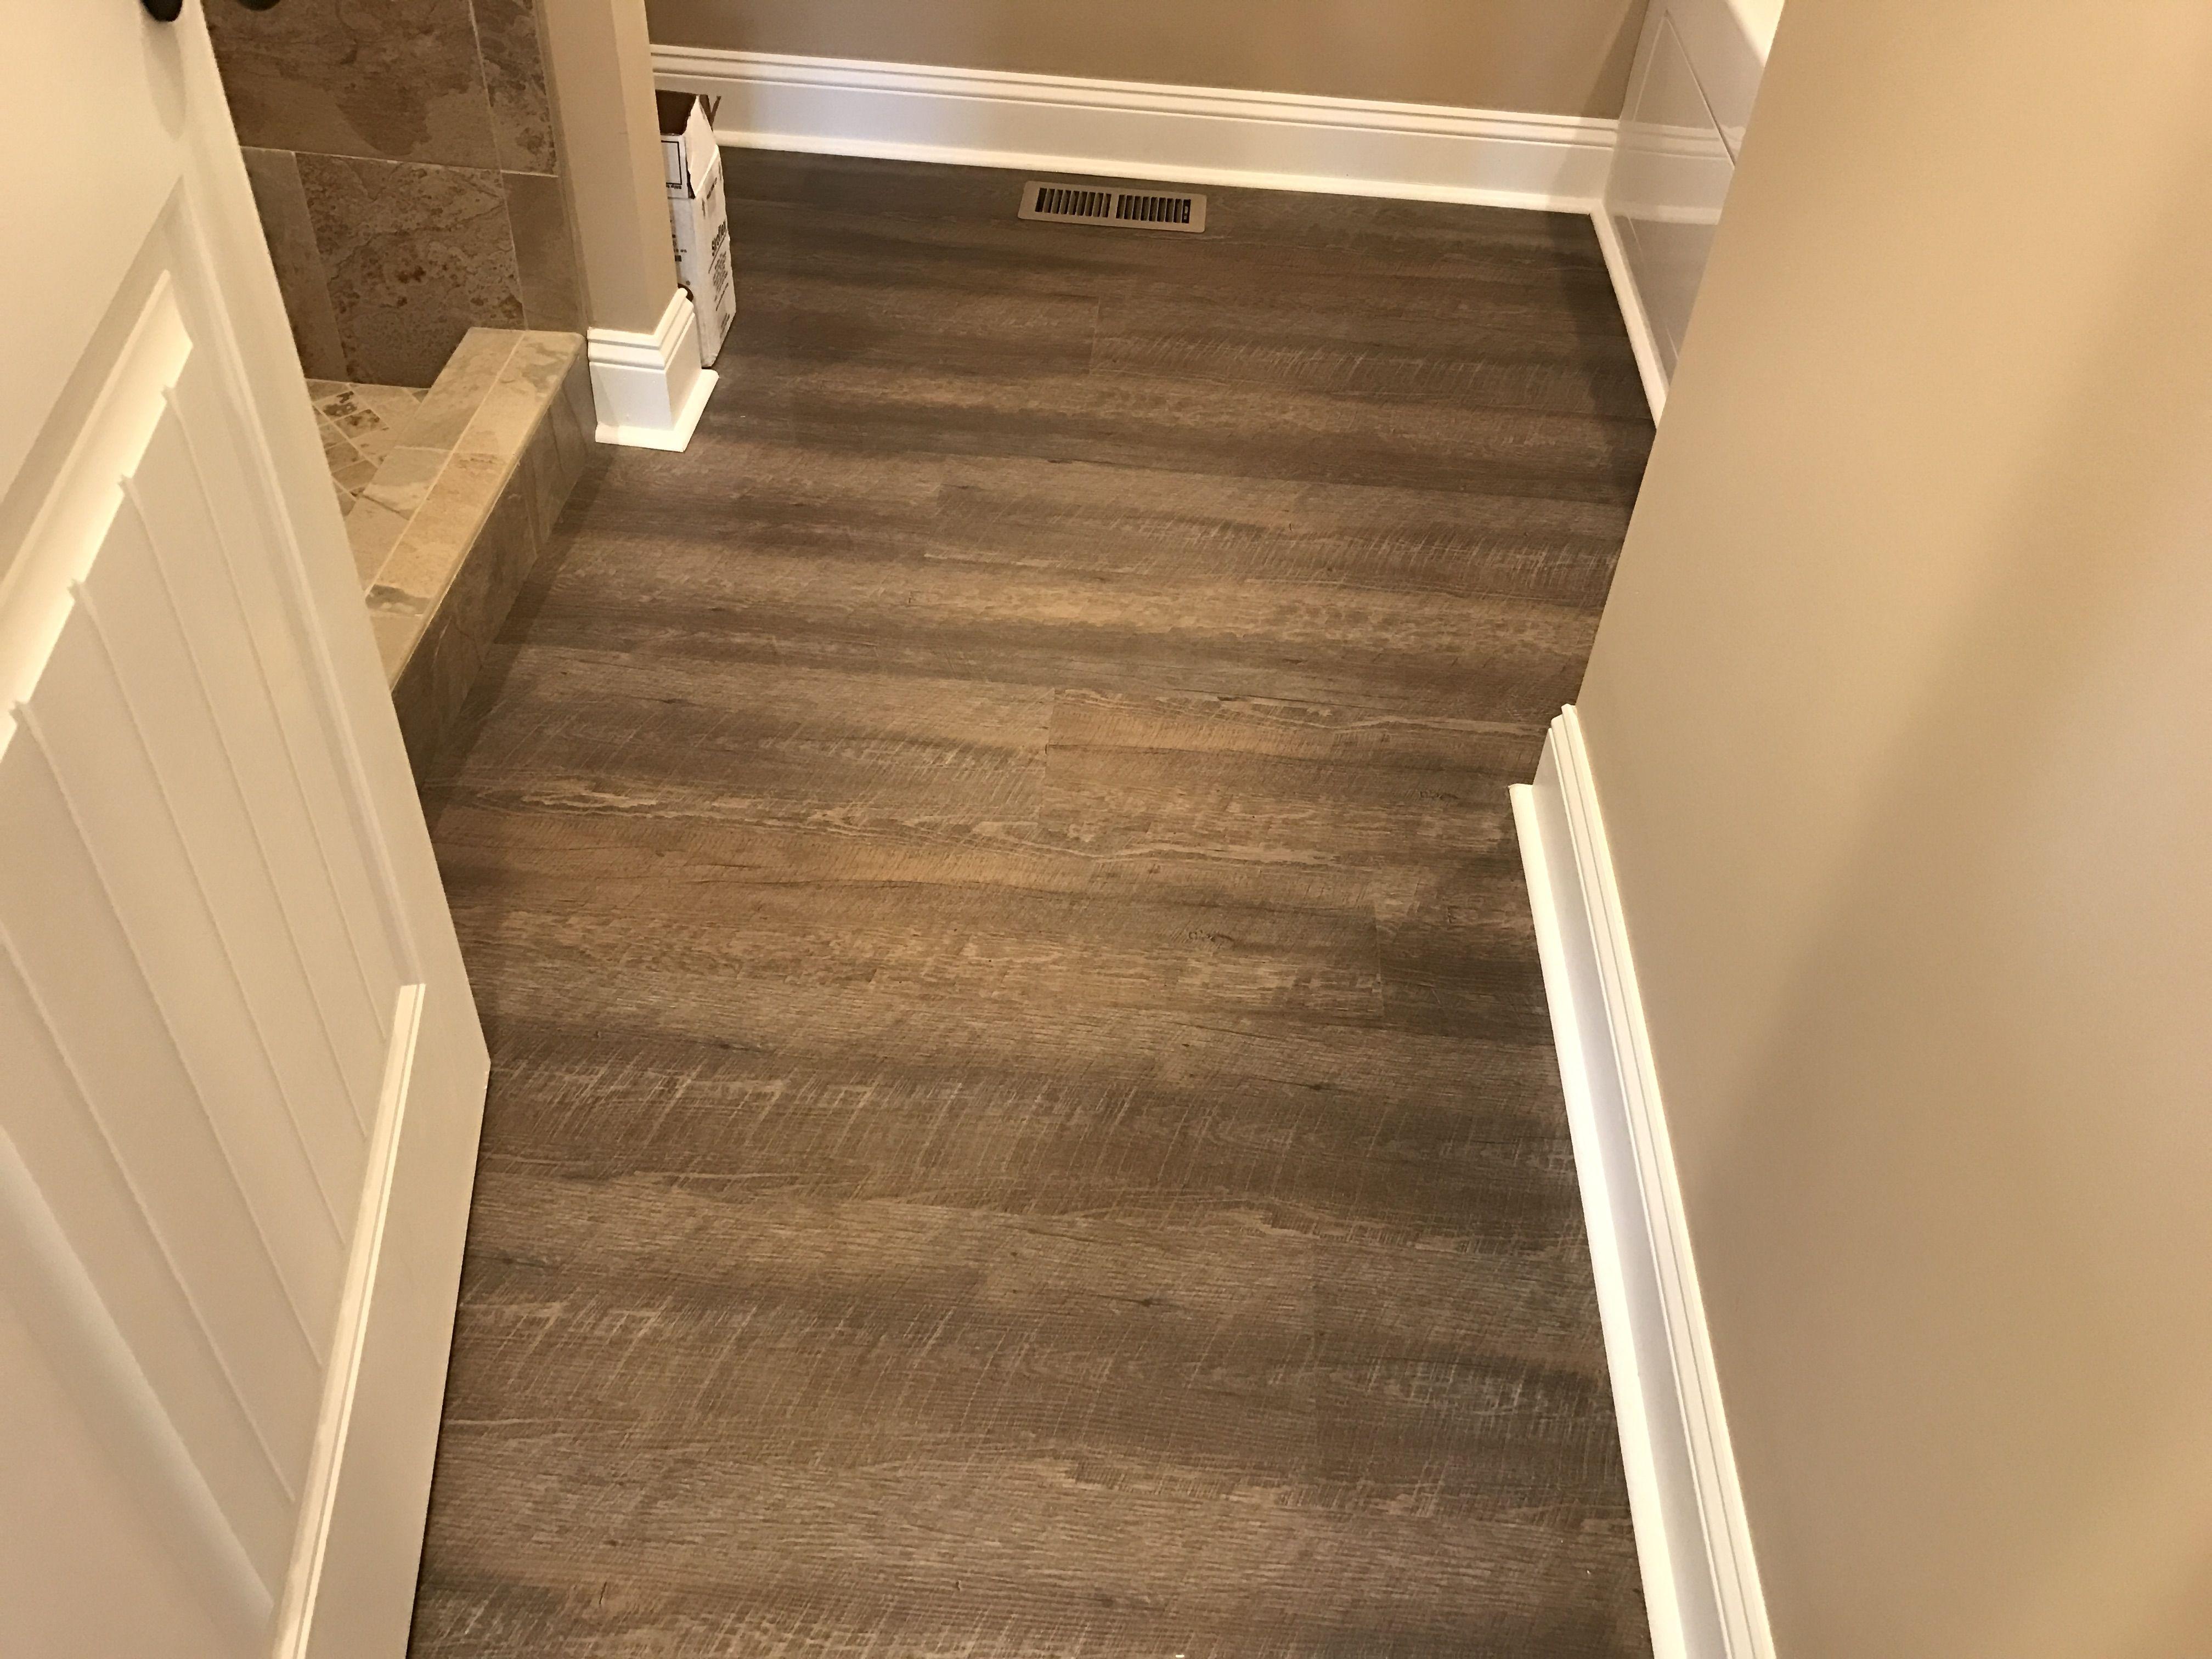 Coretec Plus Deep Smoked Oak Smoked Oak Floor Vinyl Plank Flooring Coretec Flooring